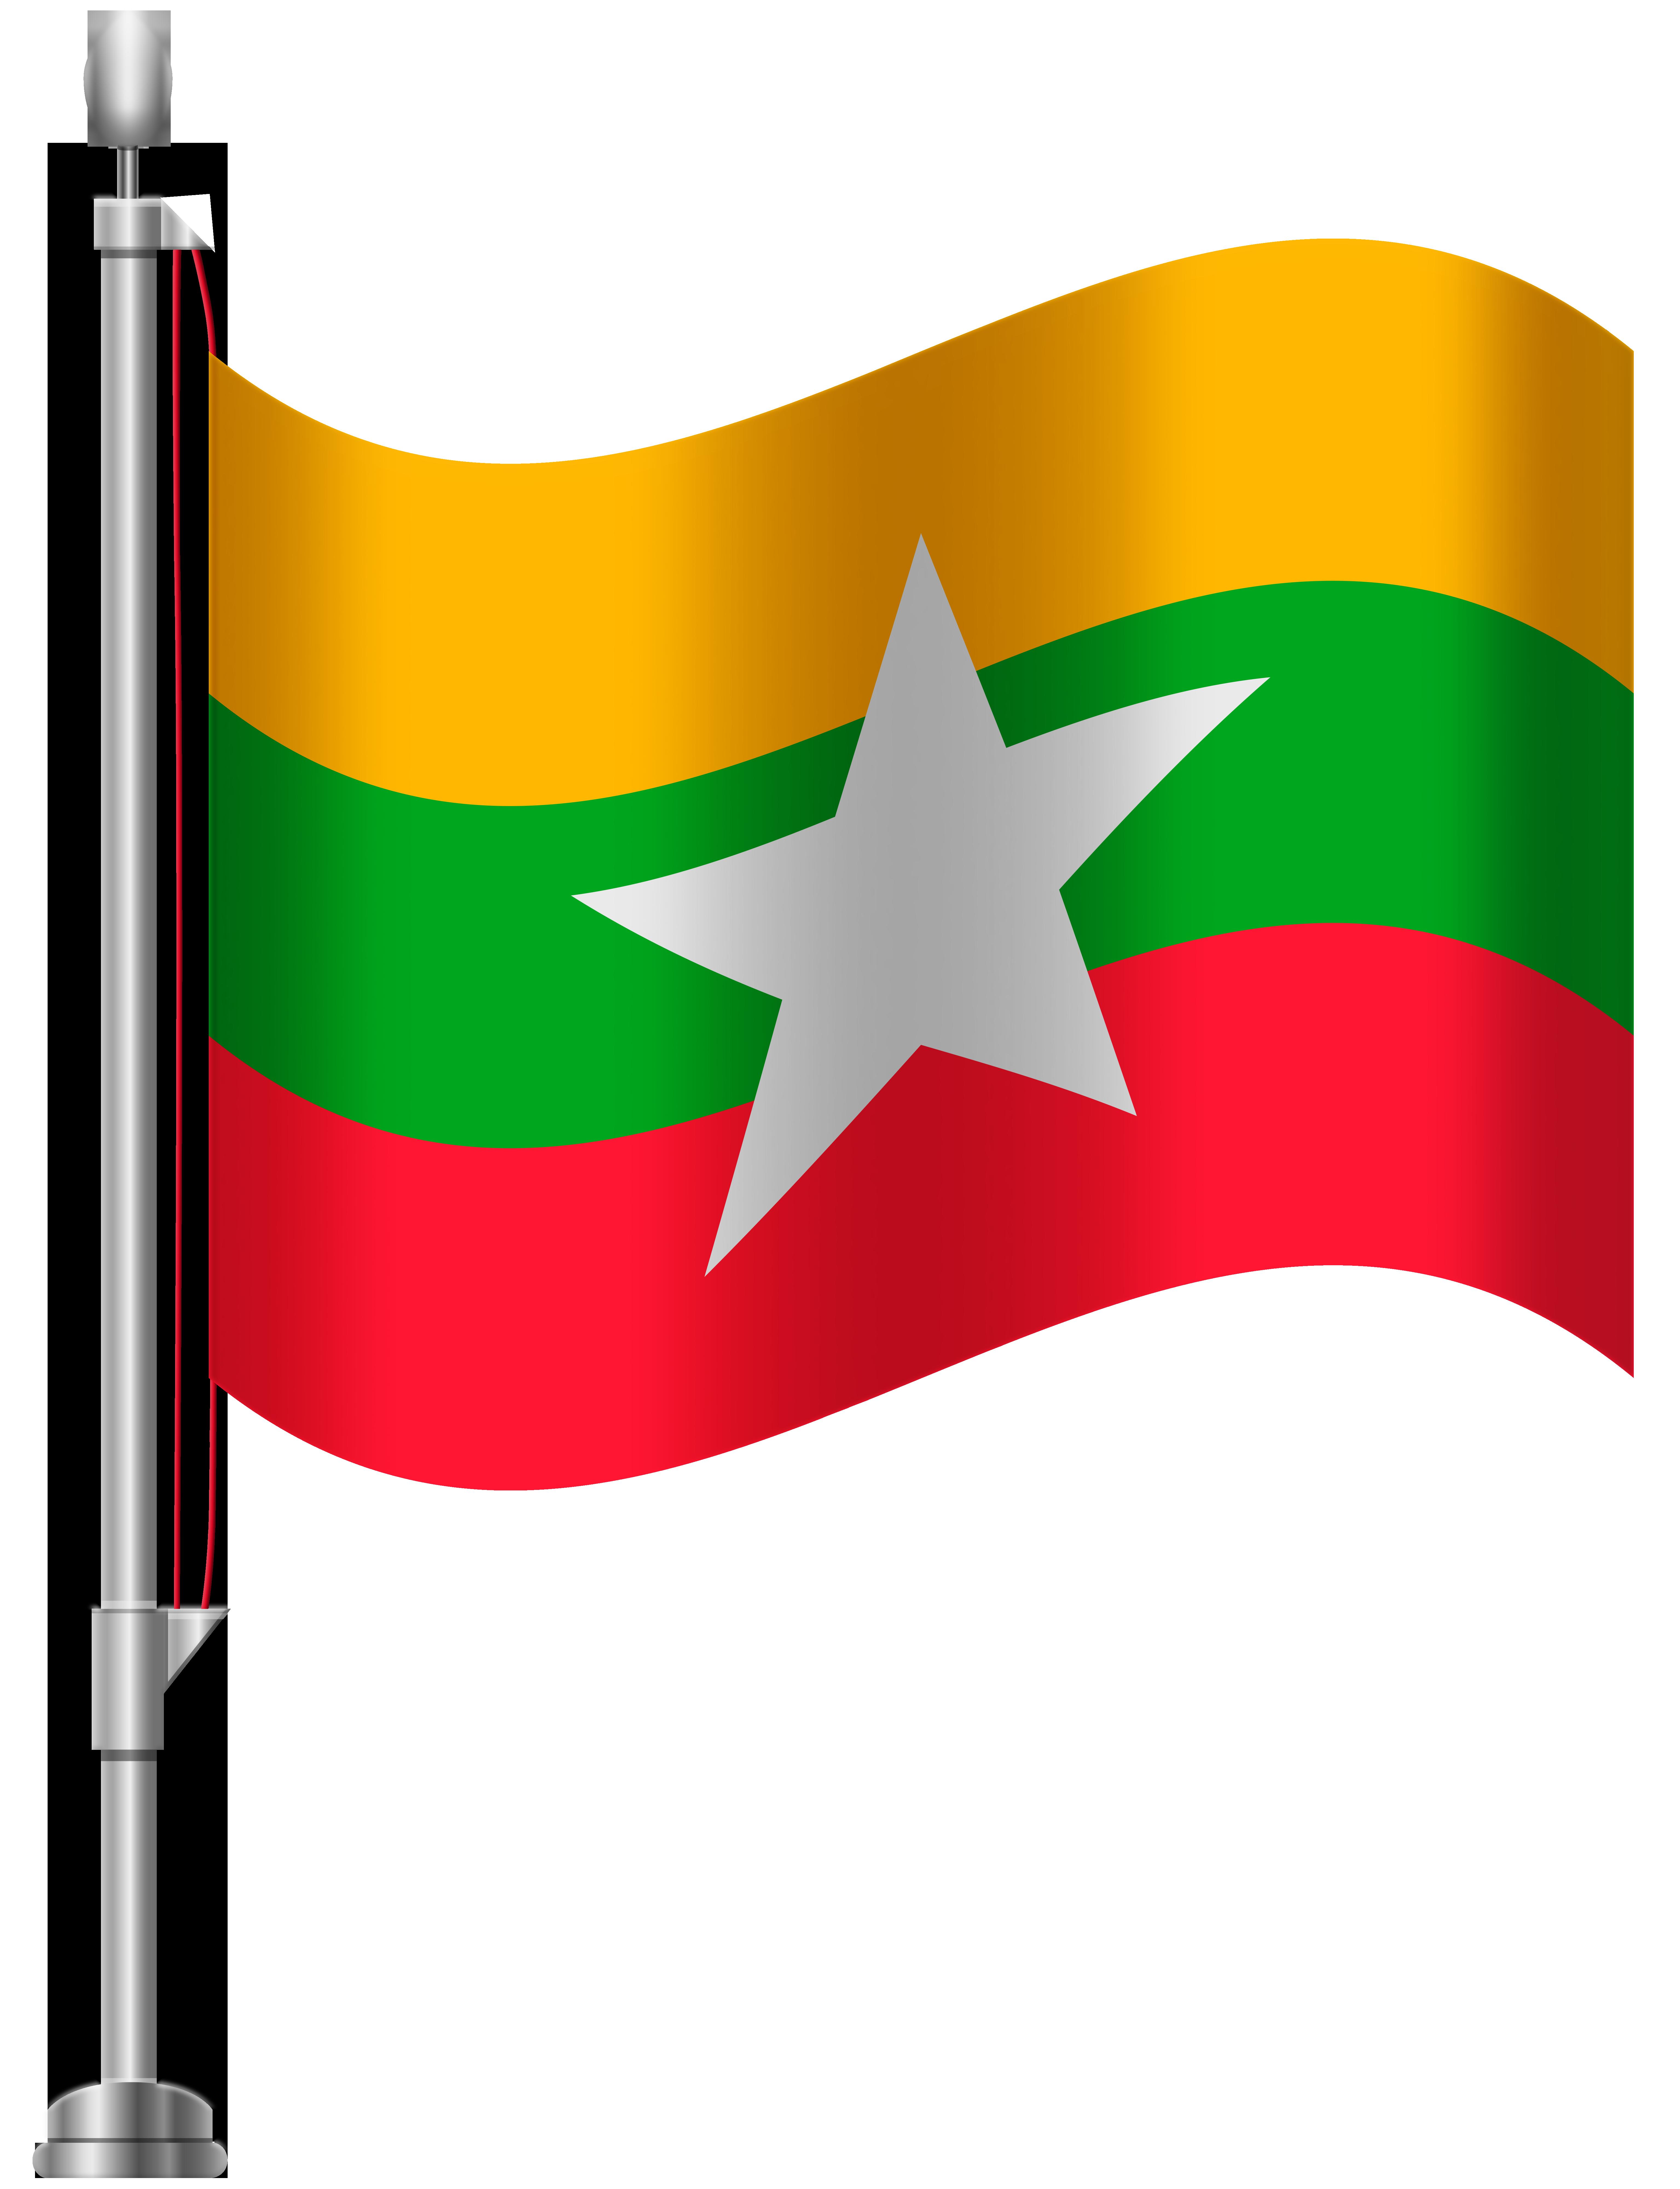 Clipart airplane flag. Myanmar png clip art